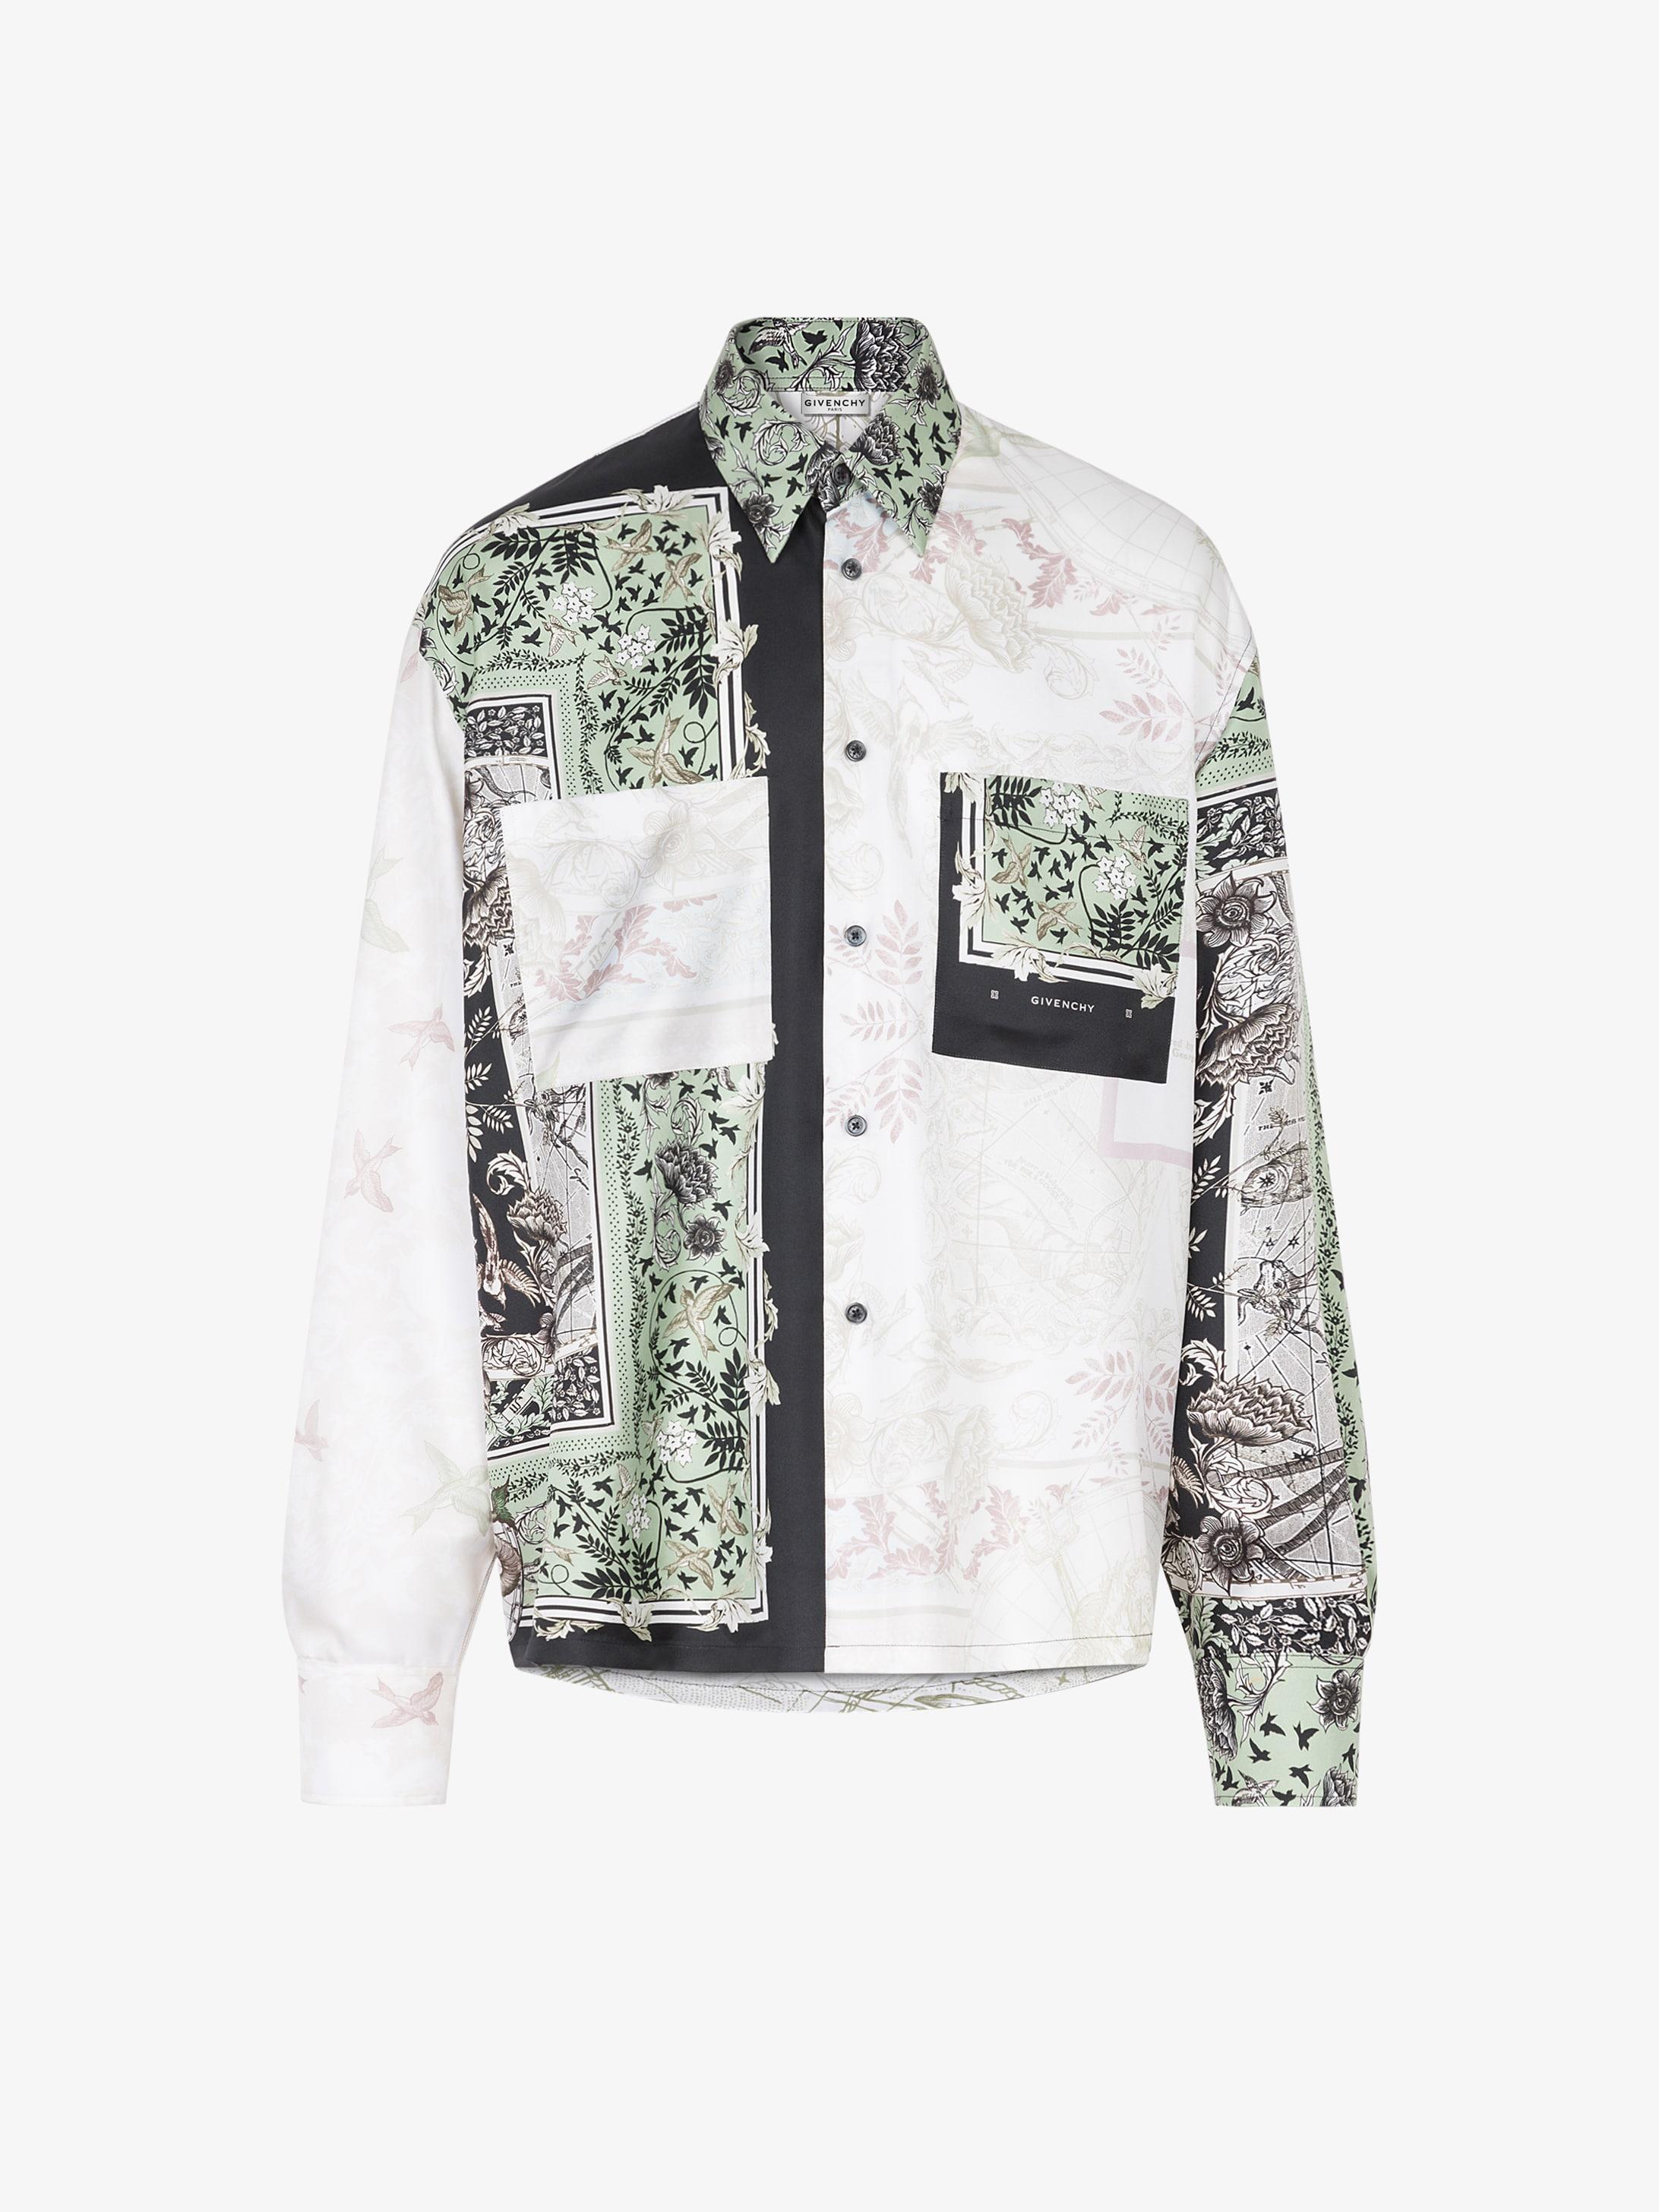 Atlantis patchwork printed shirt